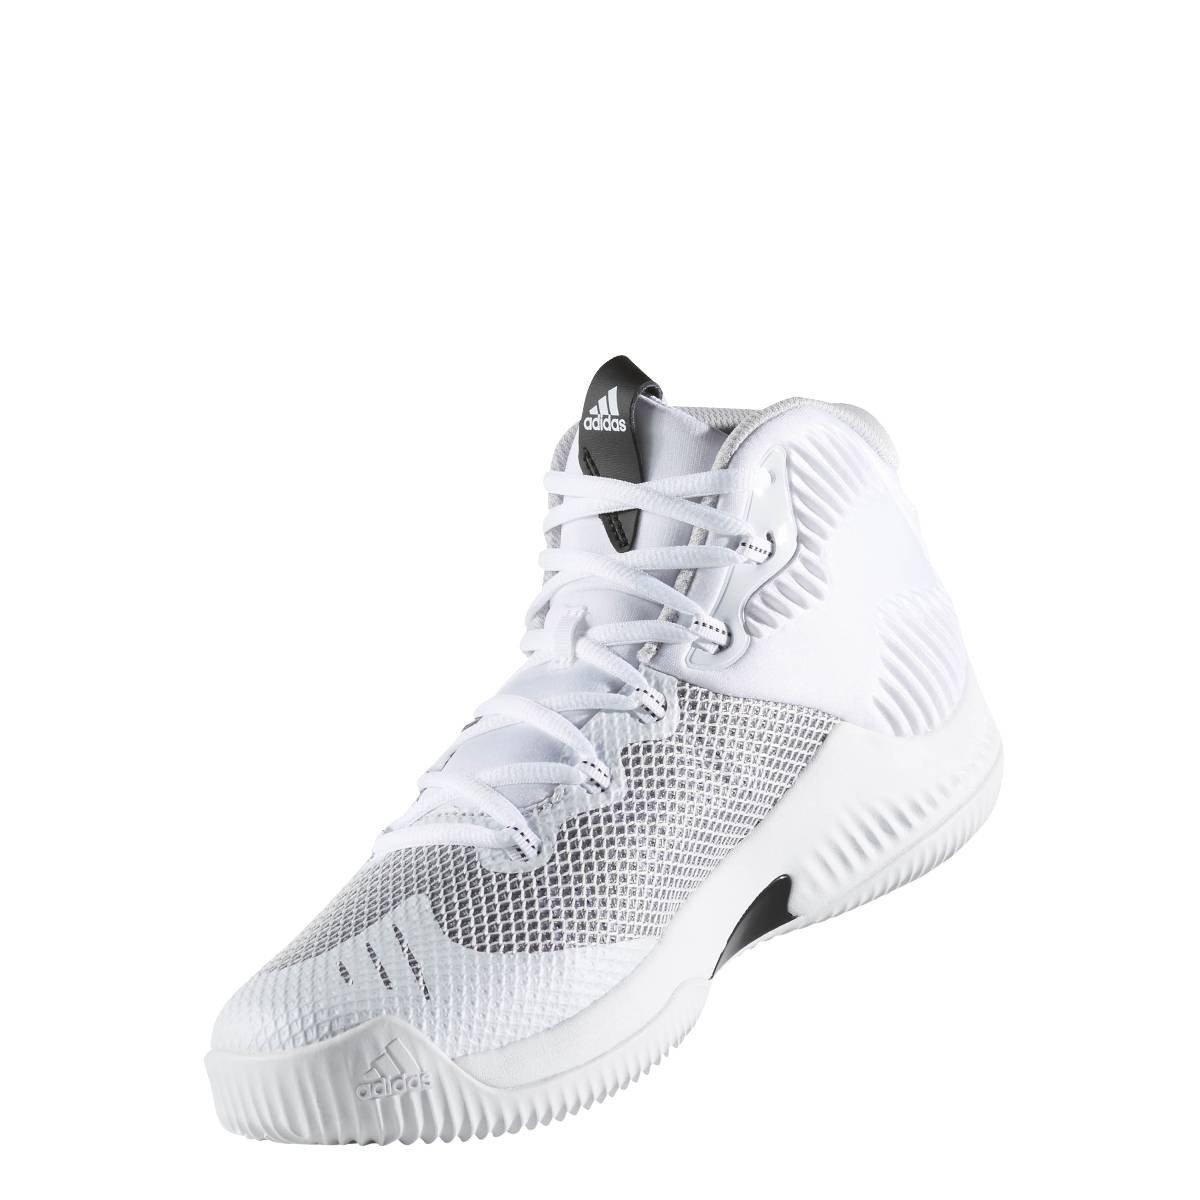 adidas Crazy Hustle, Scarpe da Basket Uomo, Bianco (Ftwbla